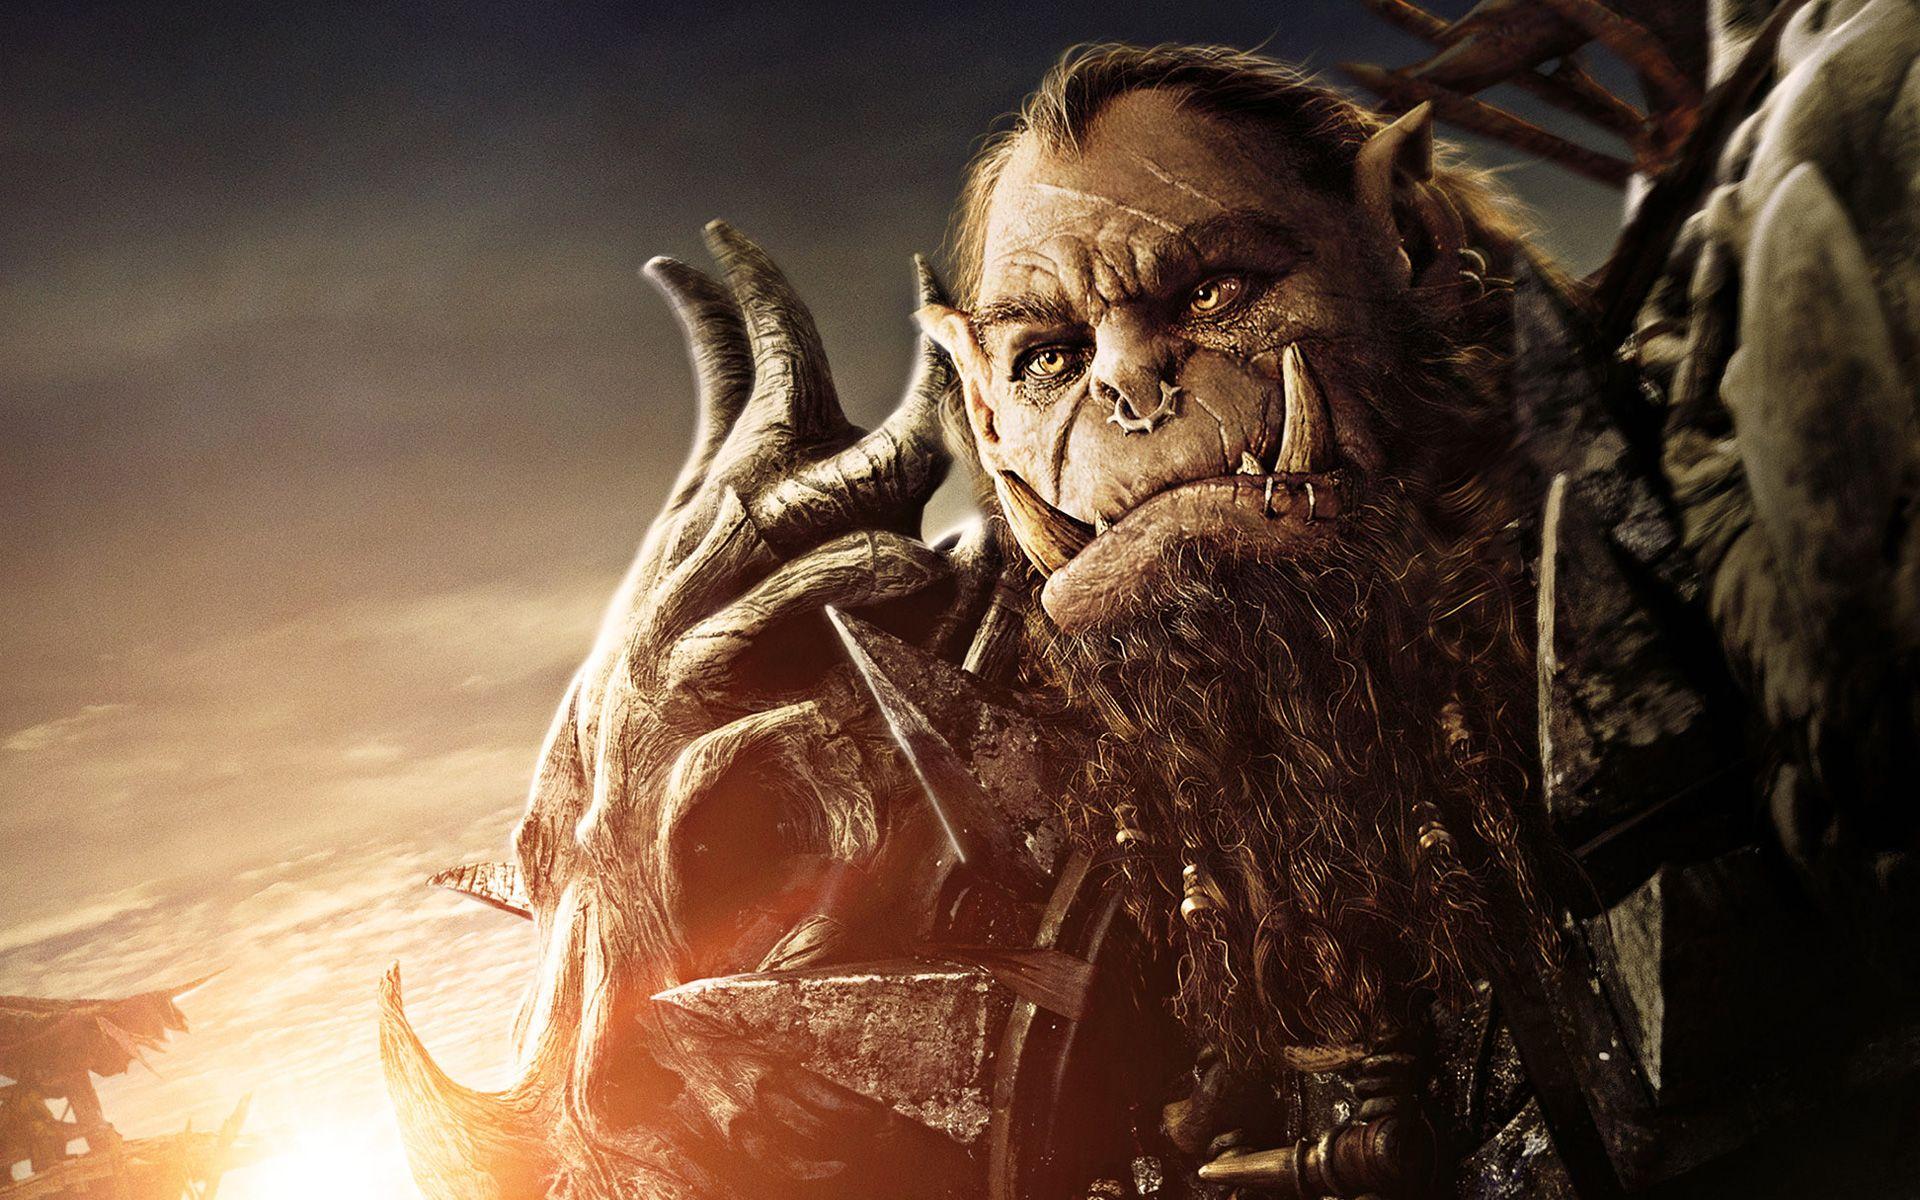 Blackhand Warcraft Movie Wide 1200 X 1920 Hd Backgrounds